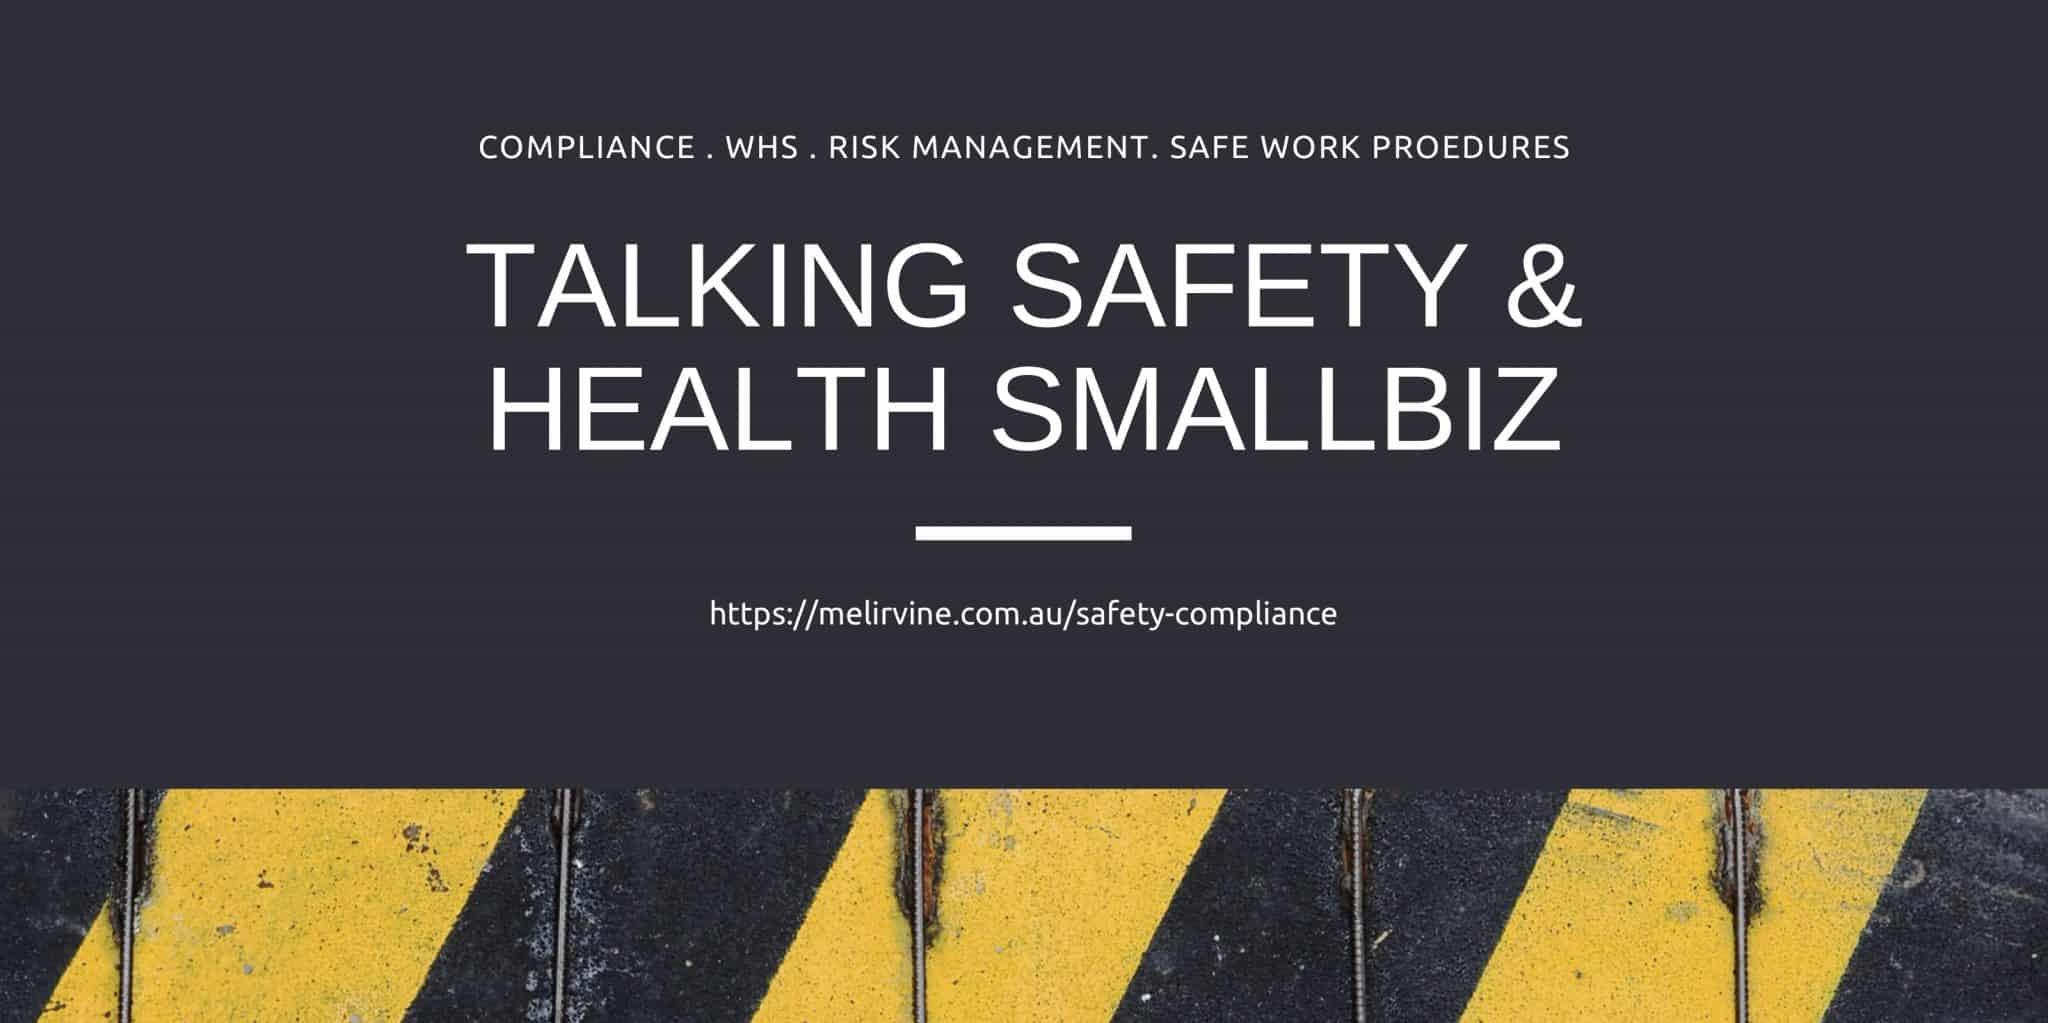 talking safety and health smallbiz with Melinda J. Irvine